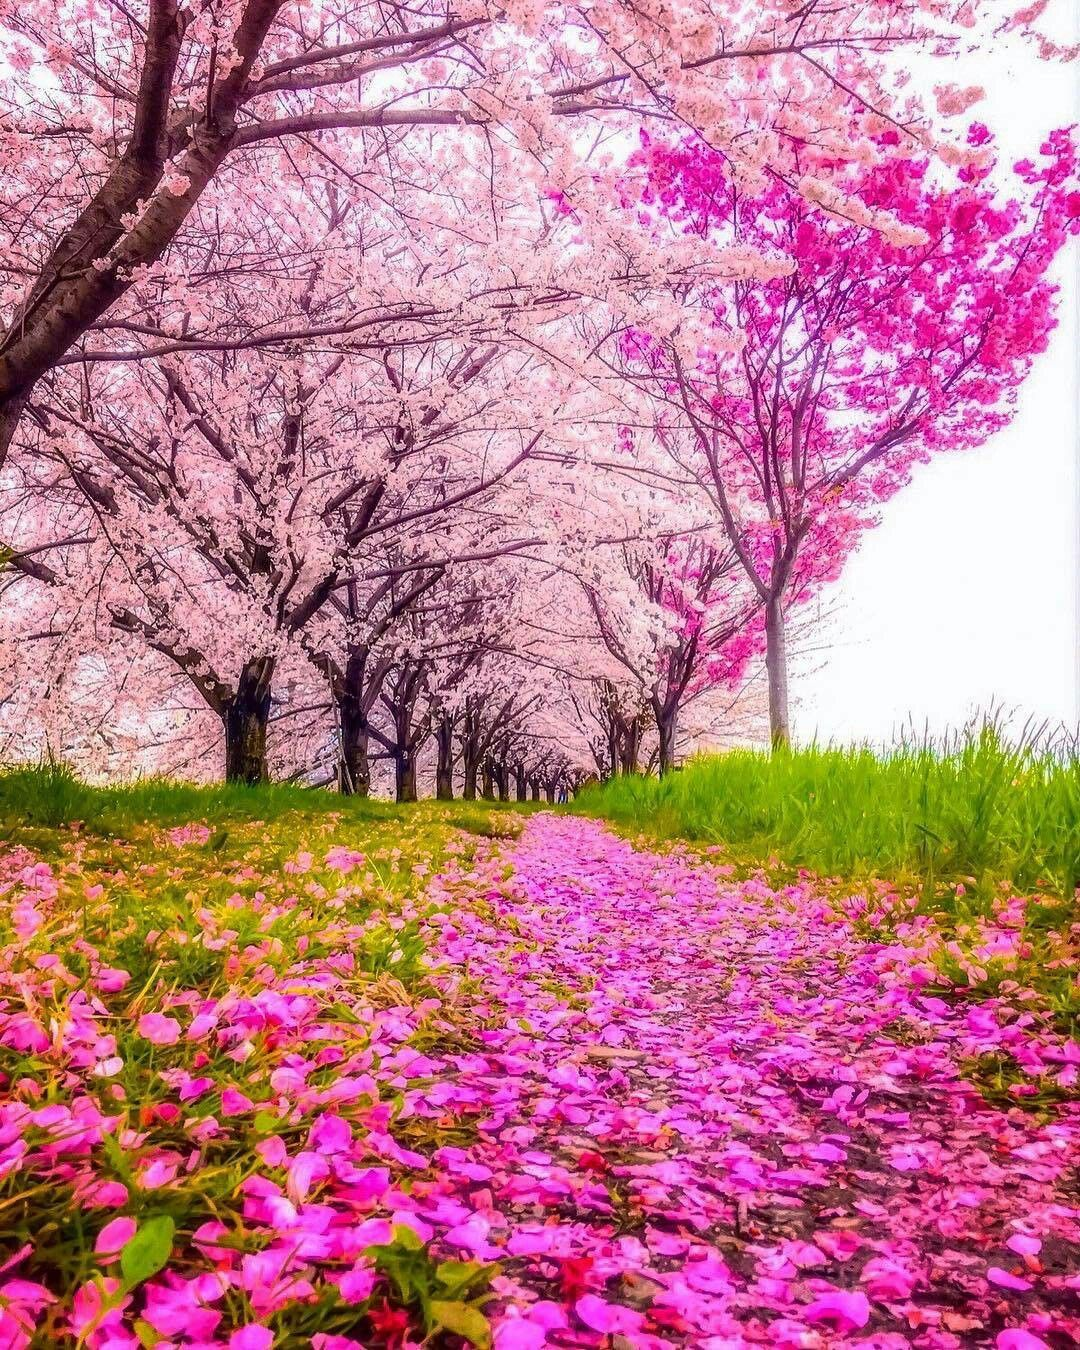 Pin By Yul Li On Cảnh đẹp Nhan Gian Beautiful Landscapes Scenic Photos Landscape Photography